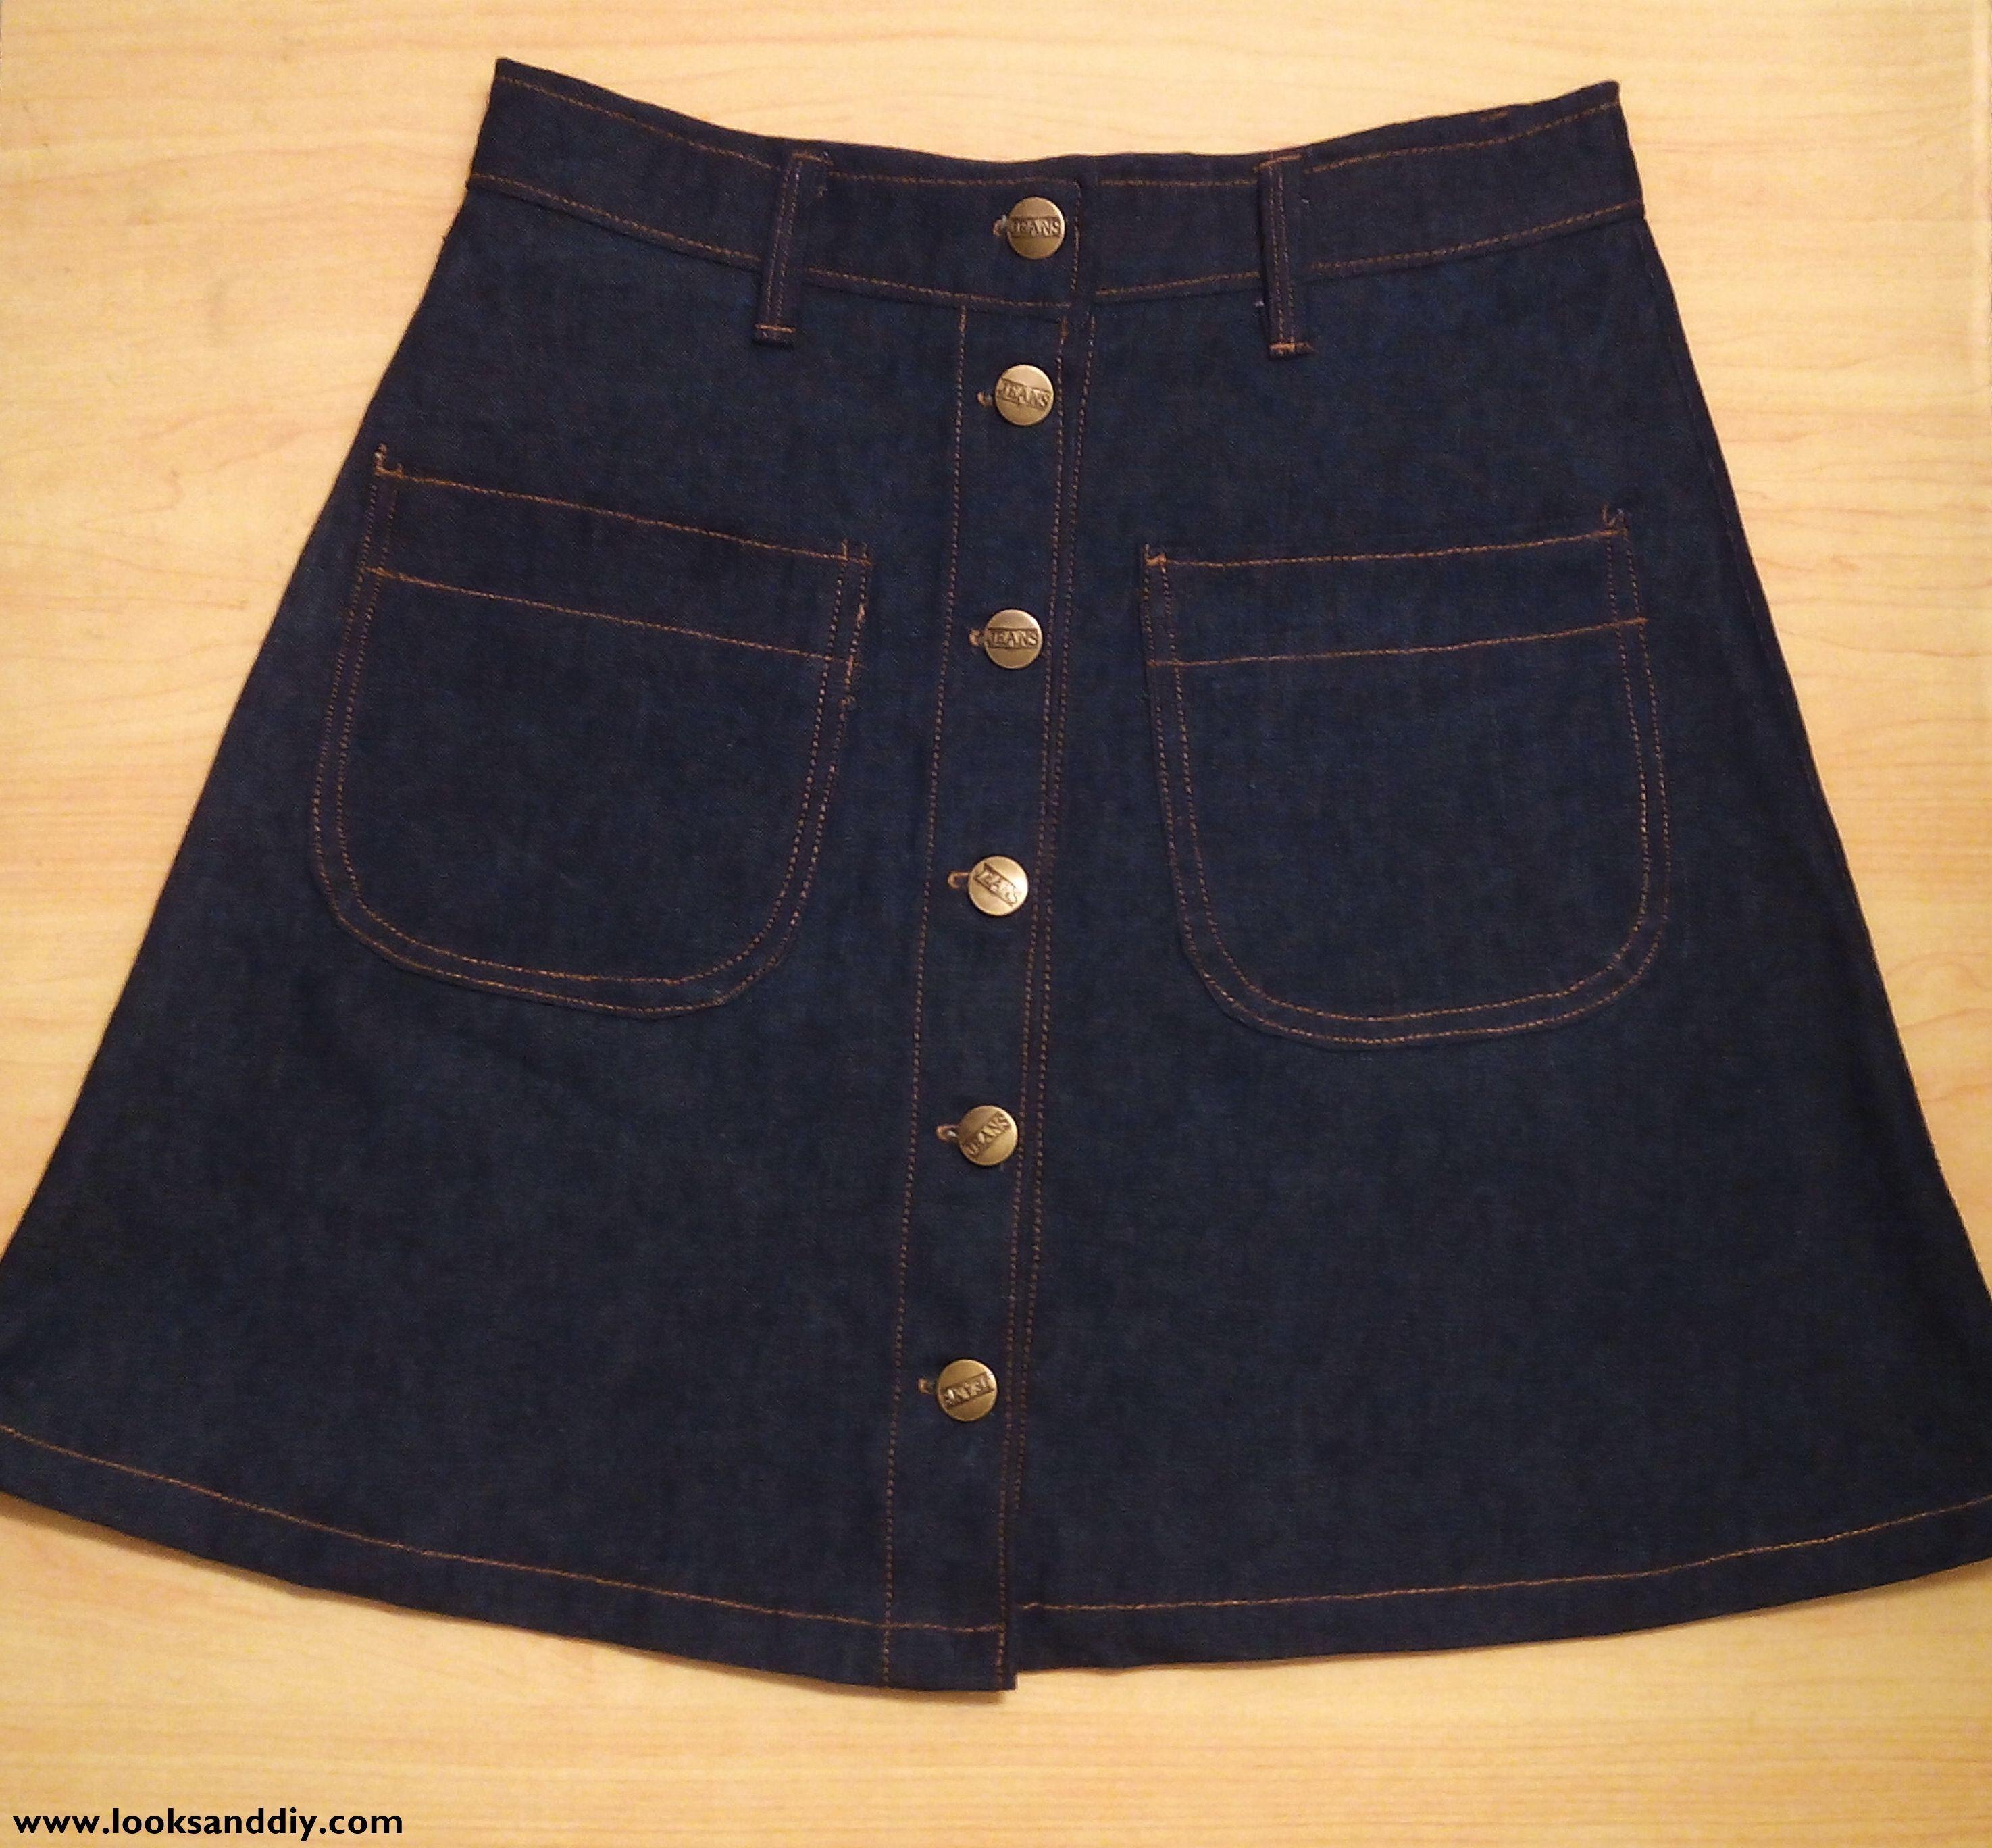 ccf7de1e4 DIY ~ Falda con botones | Moda | Faldas con botones, Faldas, Como ...